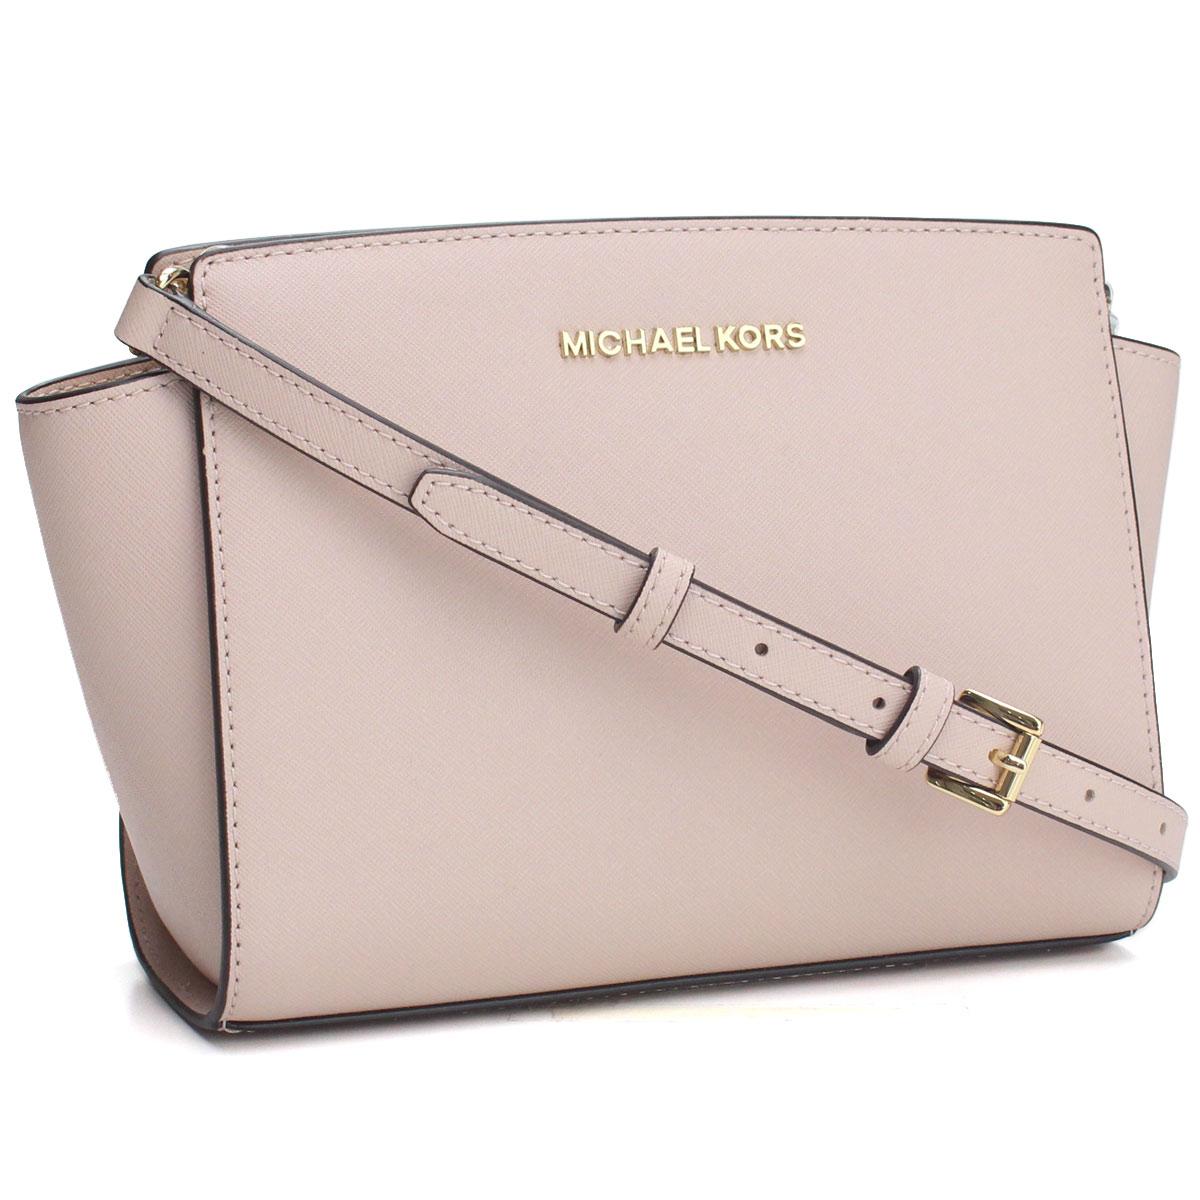 669a0d8ba024 Bighit The total brand wholesale  Take Michael Kors MICHAEL KORS SELMA  Selma slant  shoulder bag 30T3GLMM2L SOFT PINK pink system